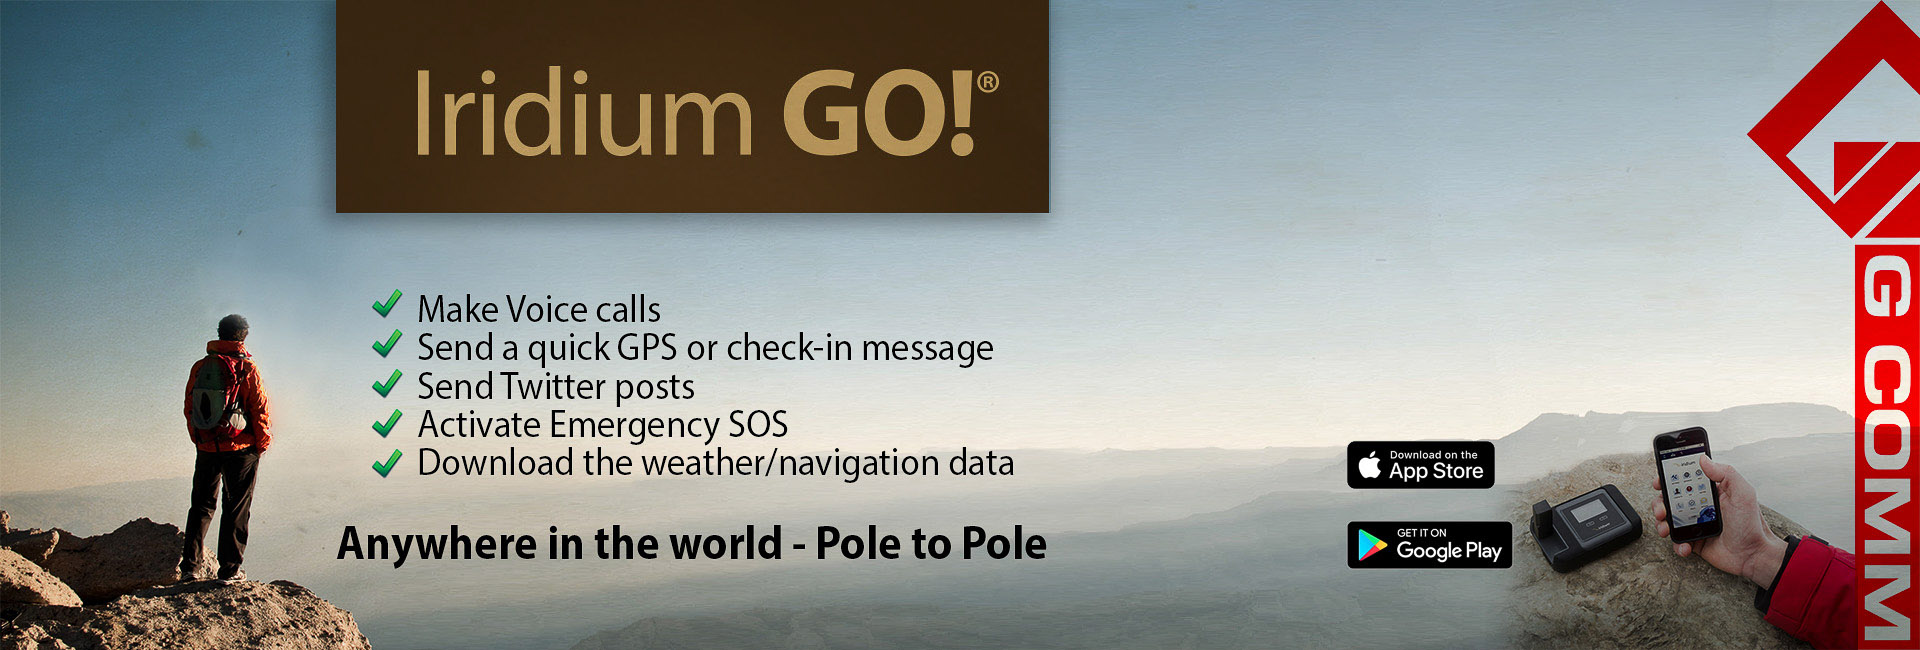 Iridium Go satellite WiFi Hotspot generator